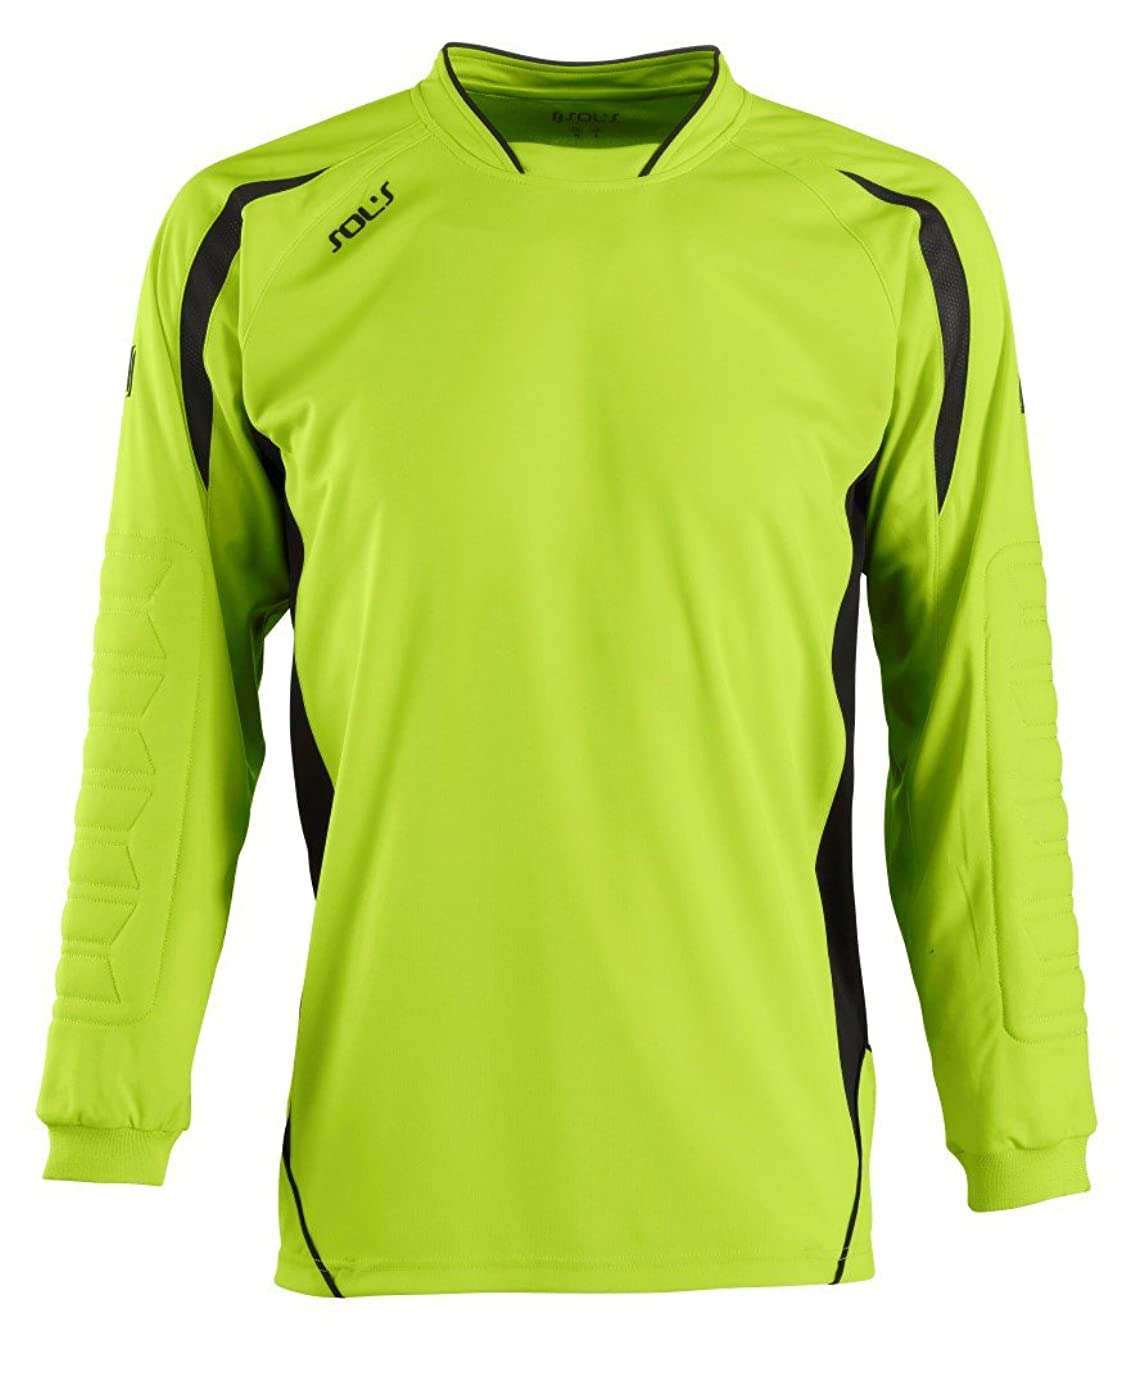 SOL'S Kids Azteca Goalkeeper Football Long Sleeve Shirt